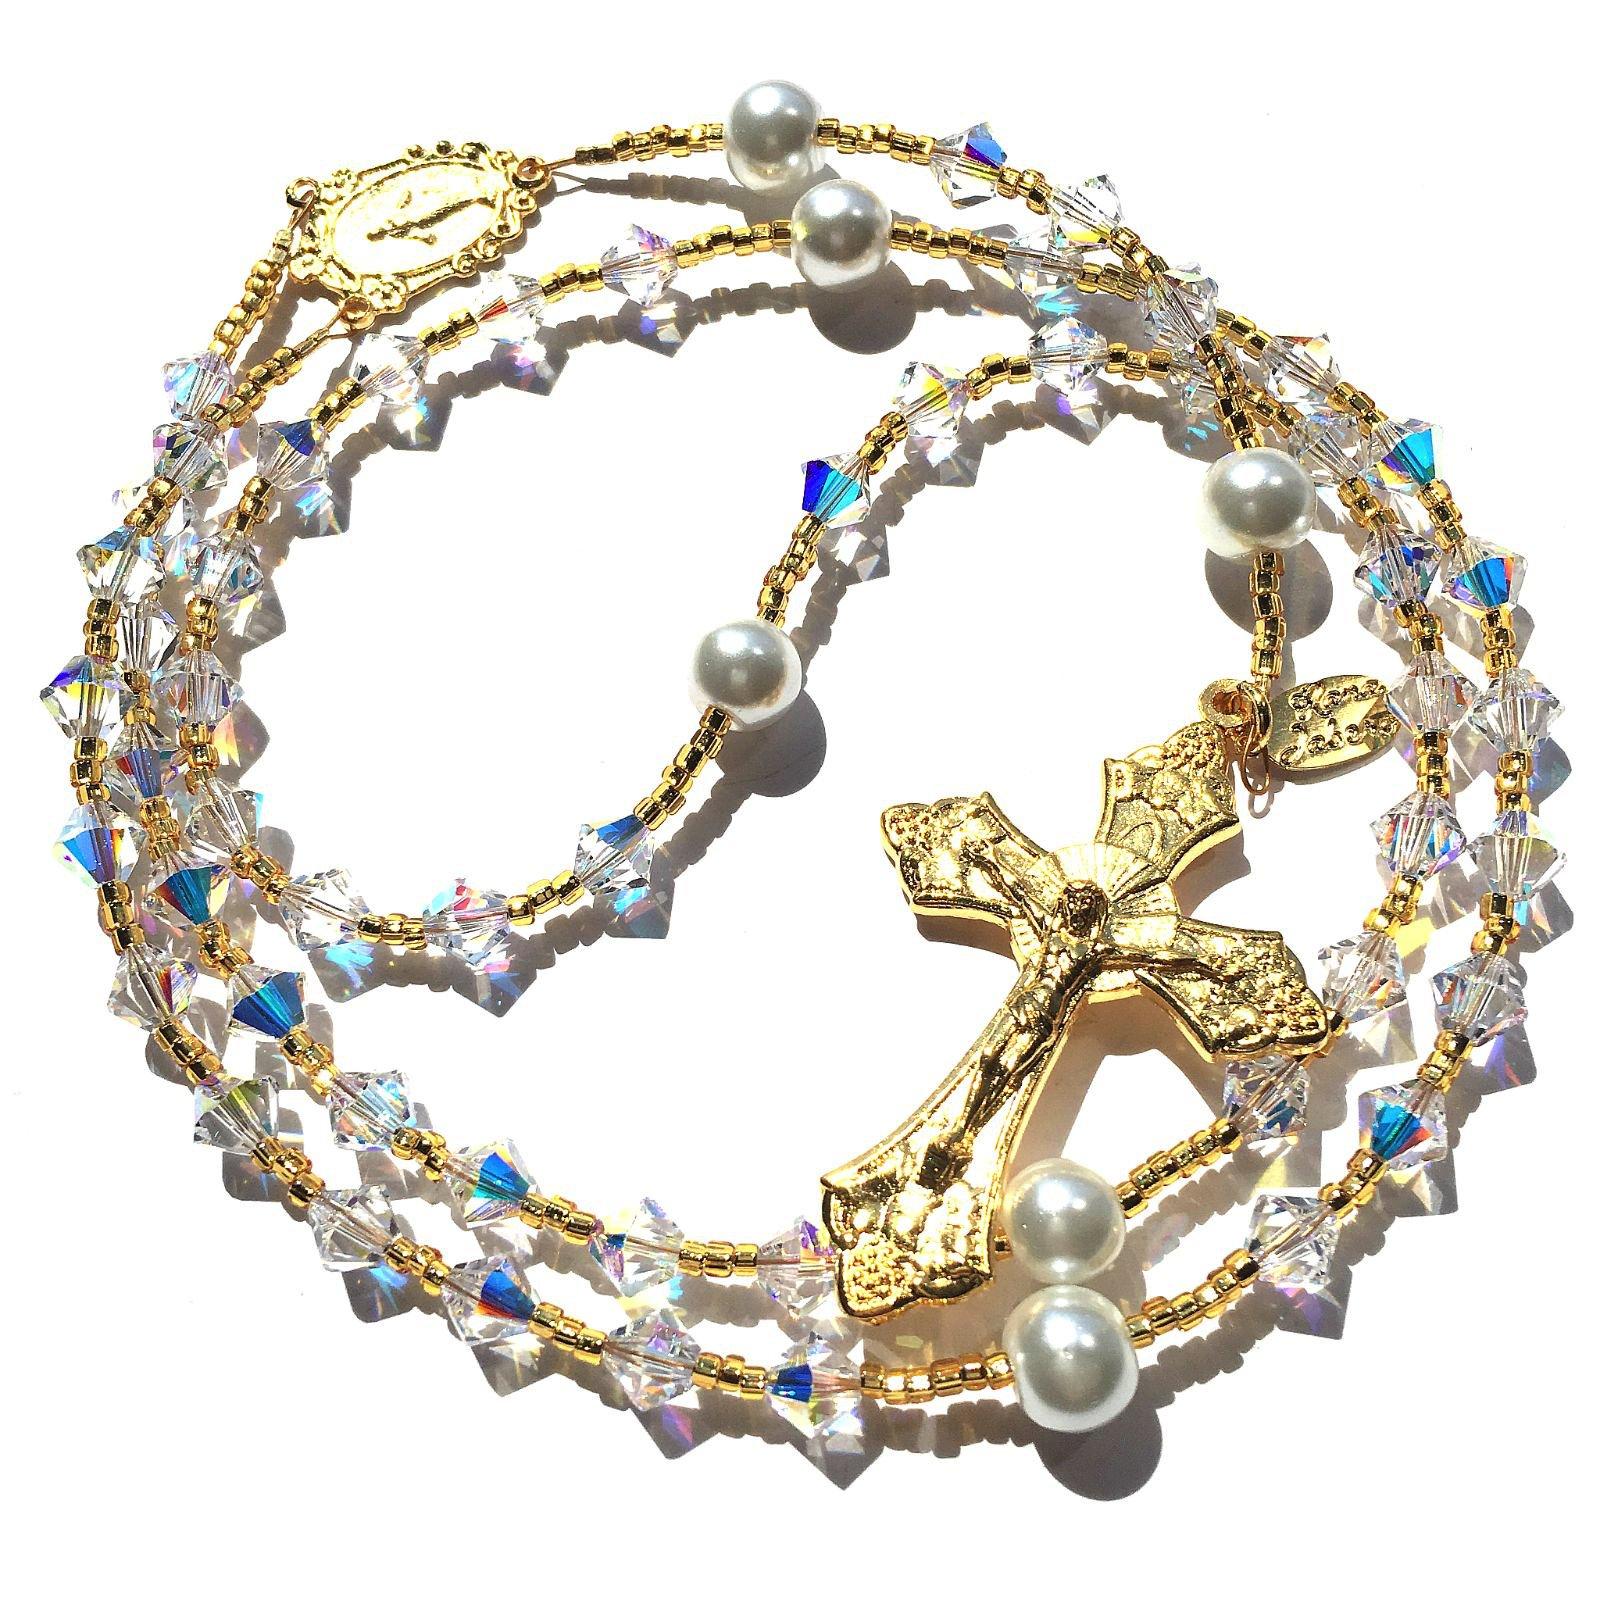 Gold (Plated) Birthstone Catholic Prayer Rosary Beads Made with Genuine Crystals from Swarovski and White Glass Pearls - Keepsake Birthday Christmas Communion Baptism Gift (Crystal AB (Iridescent)) by Rana Jabero